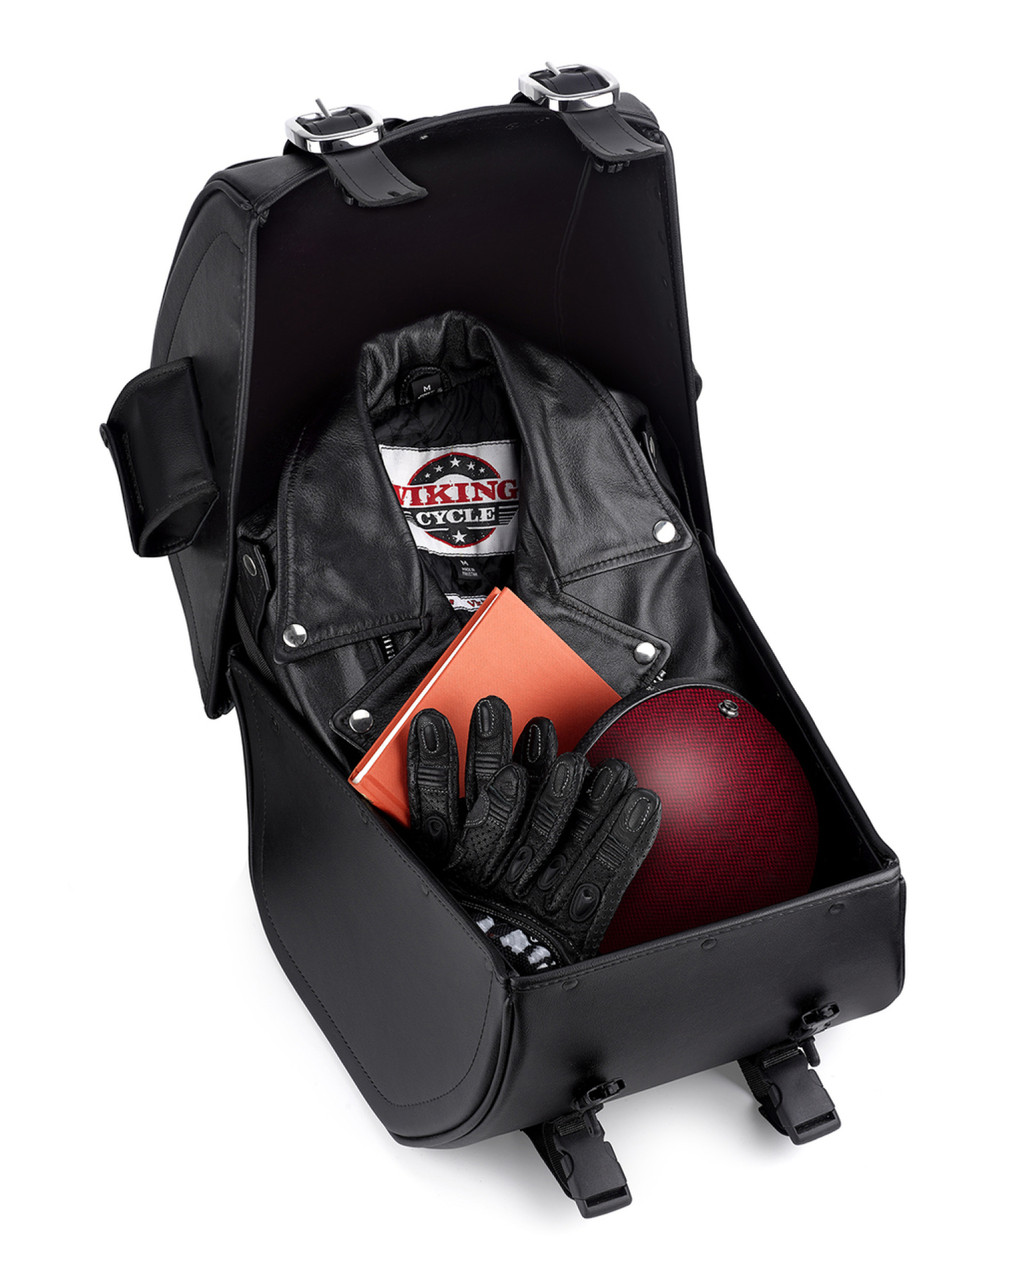 VikingBags Extra Large Classic Leather Motorcycle Sissy Bar Bag